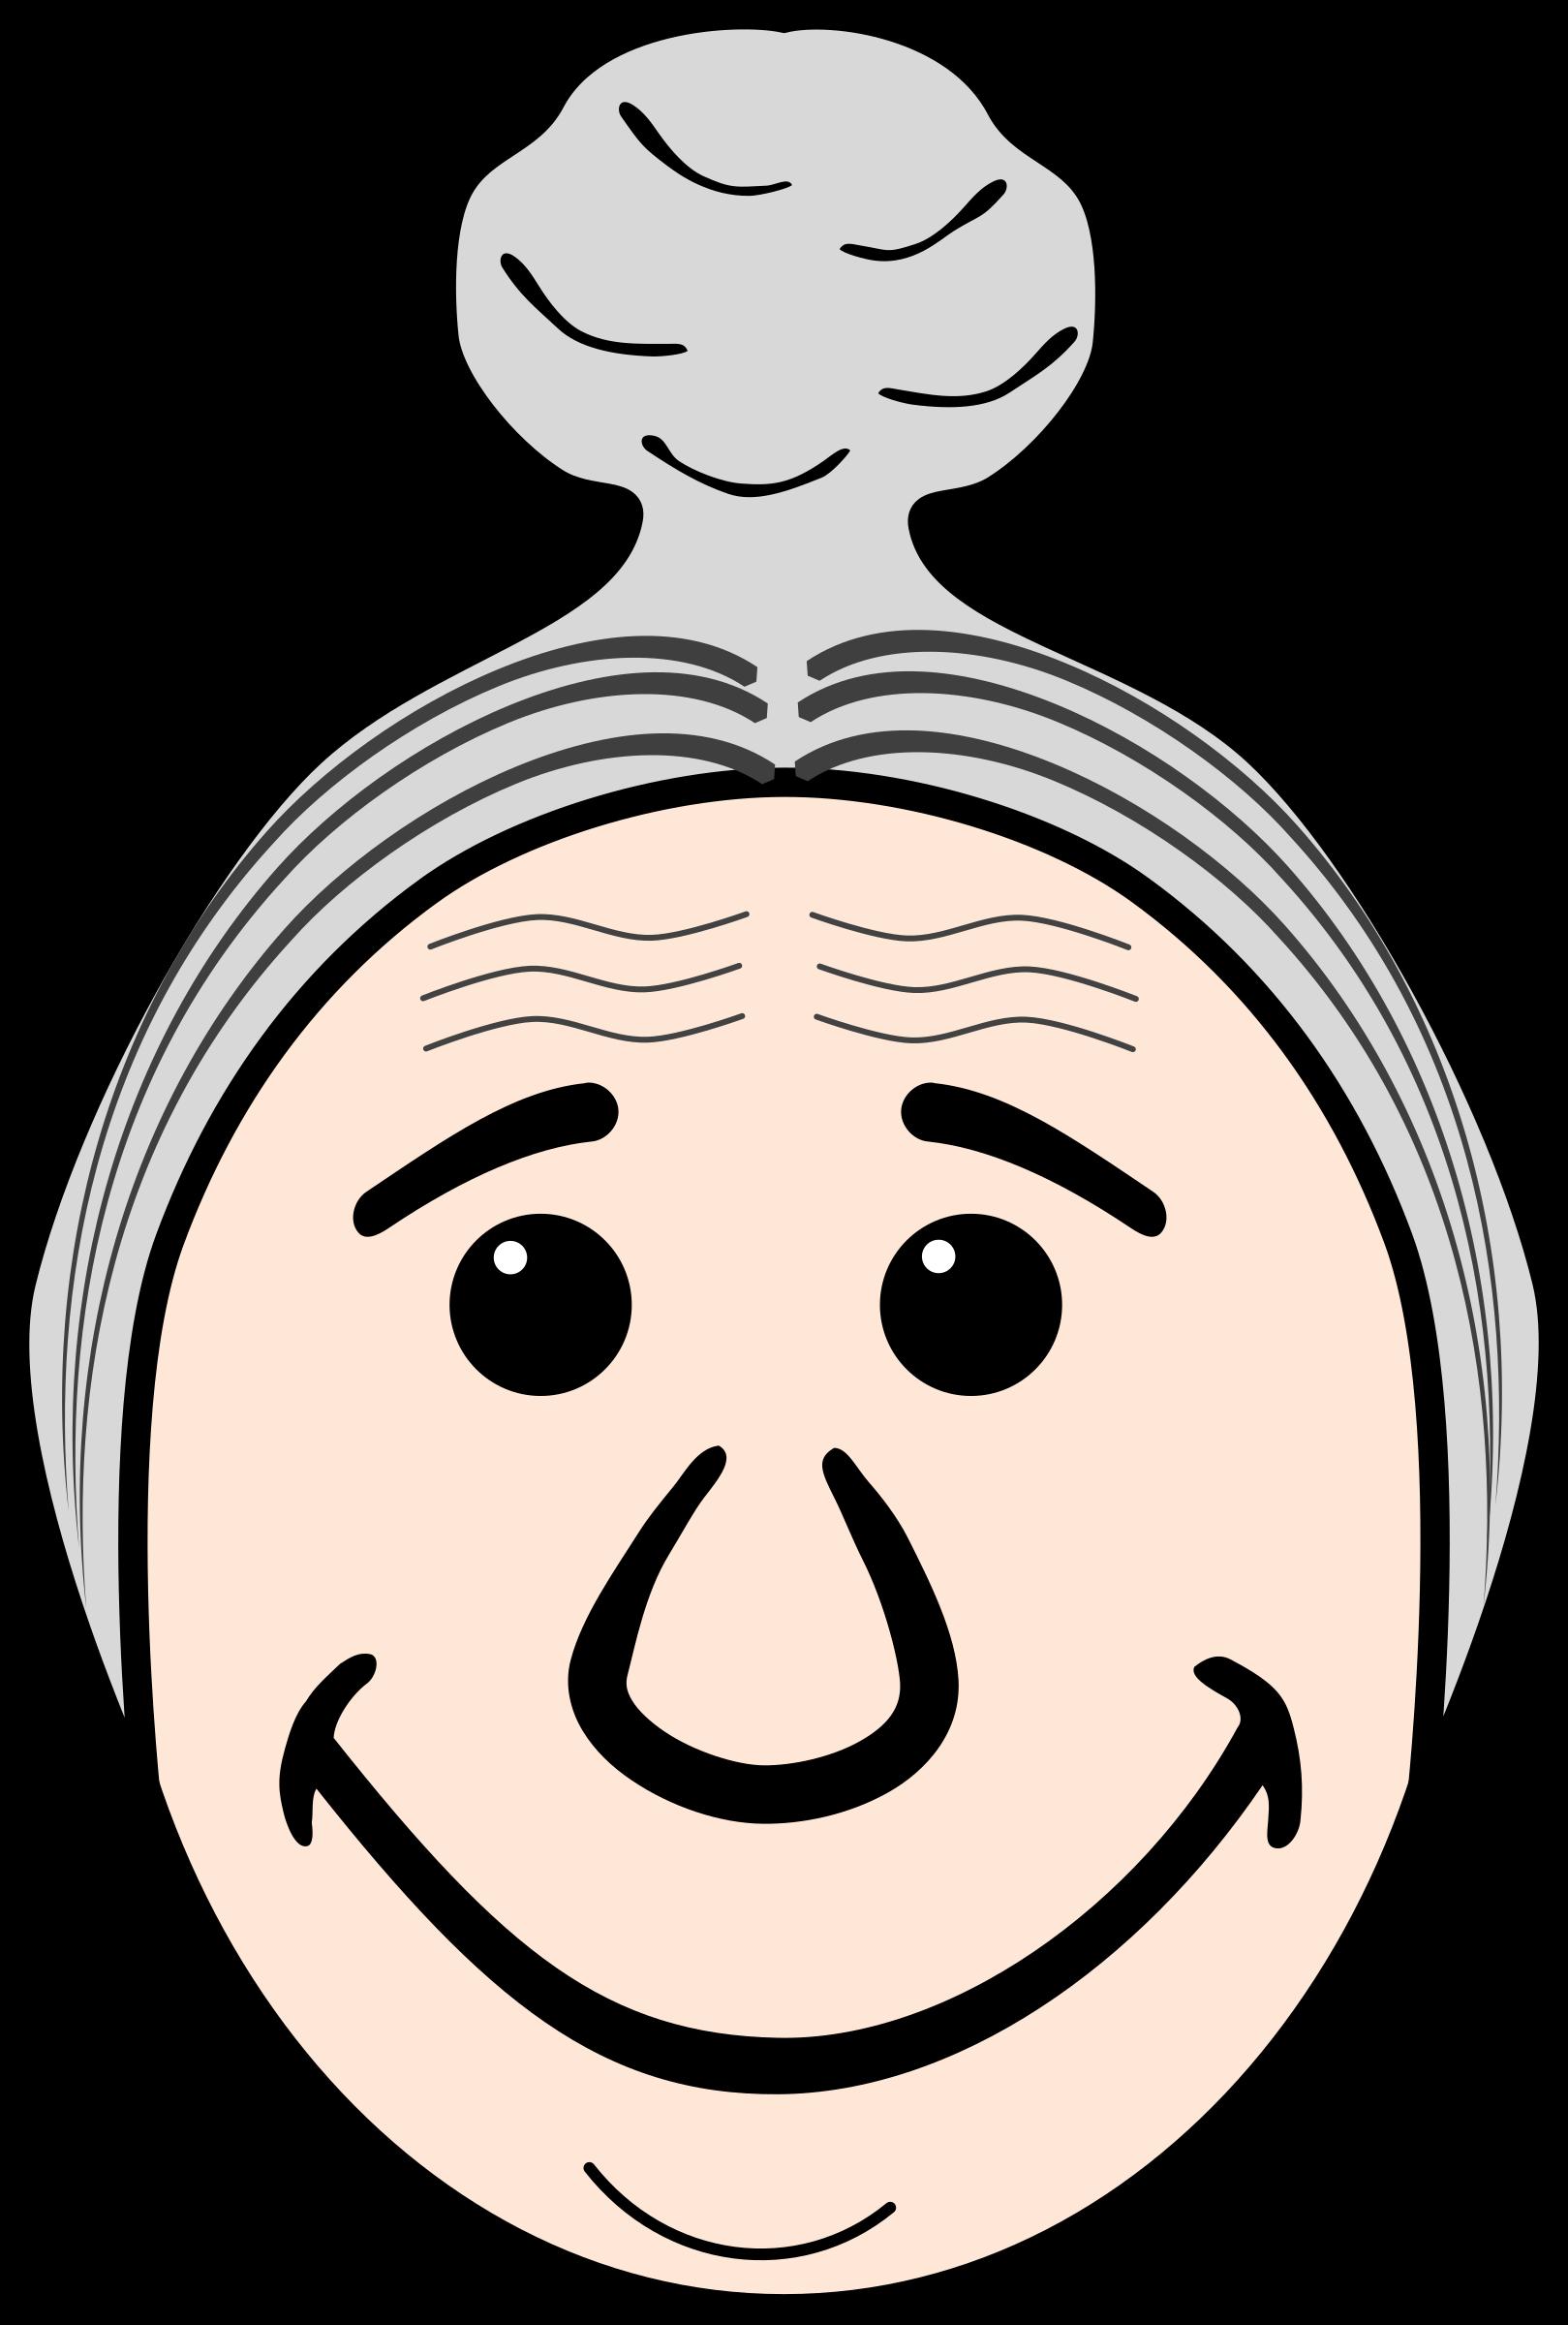 Face grandmother frames illustrations. Clipart smile grandma